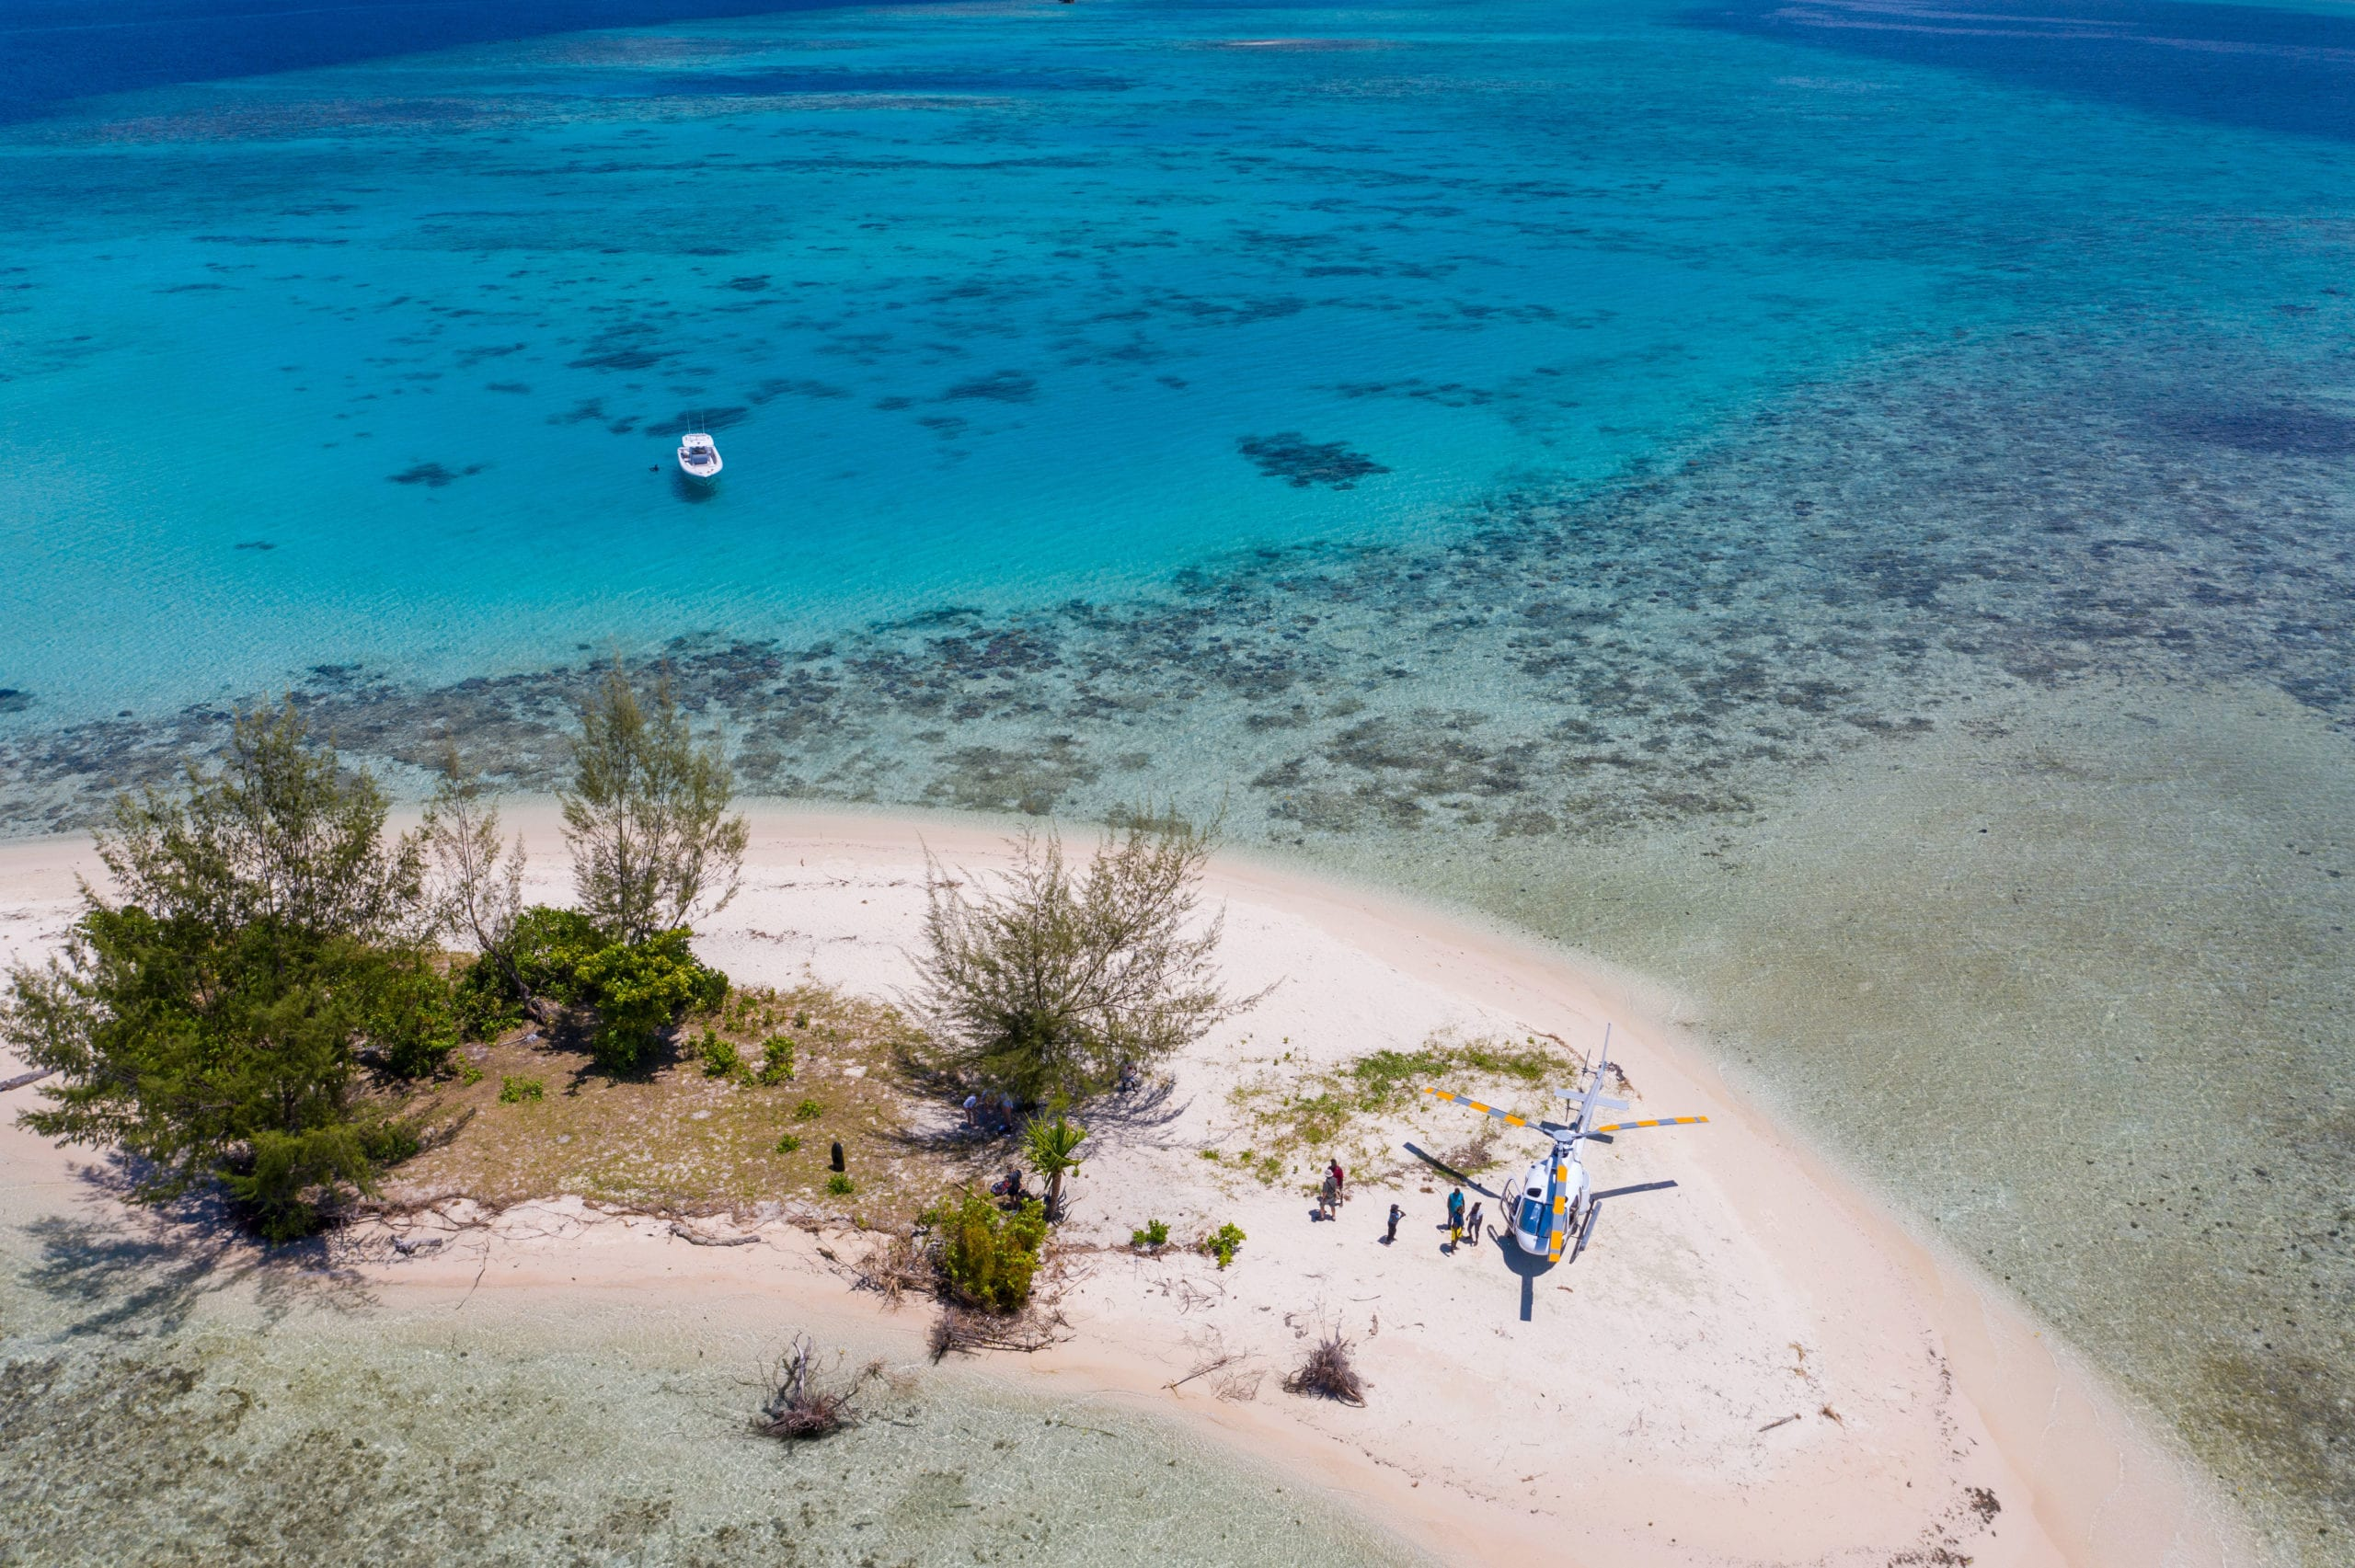 Heli on a Deserted Sand Bank Papua New Guinea